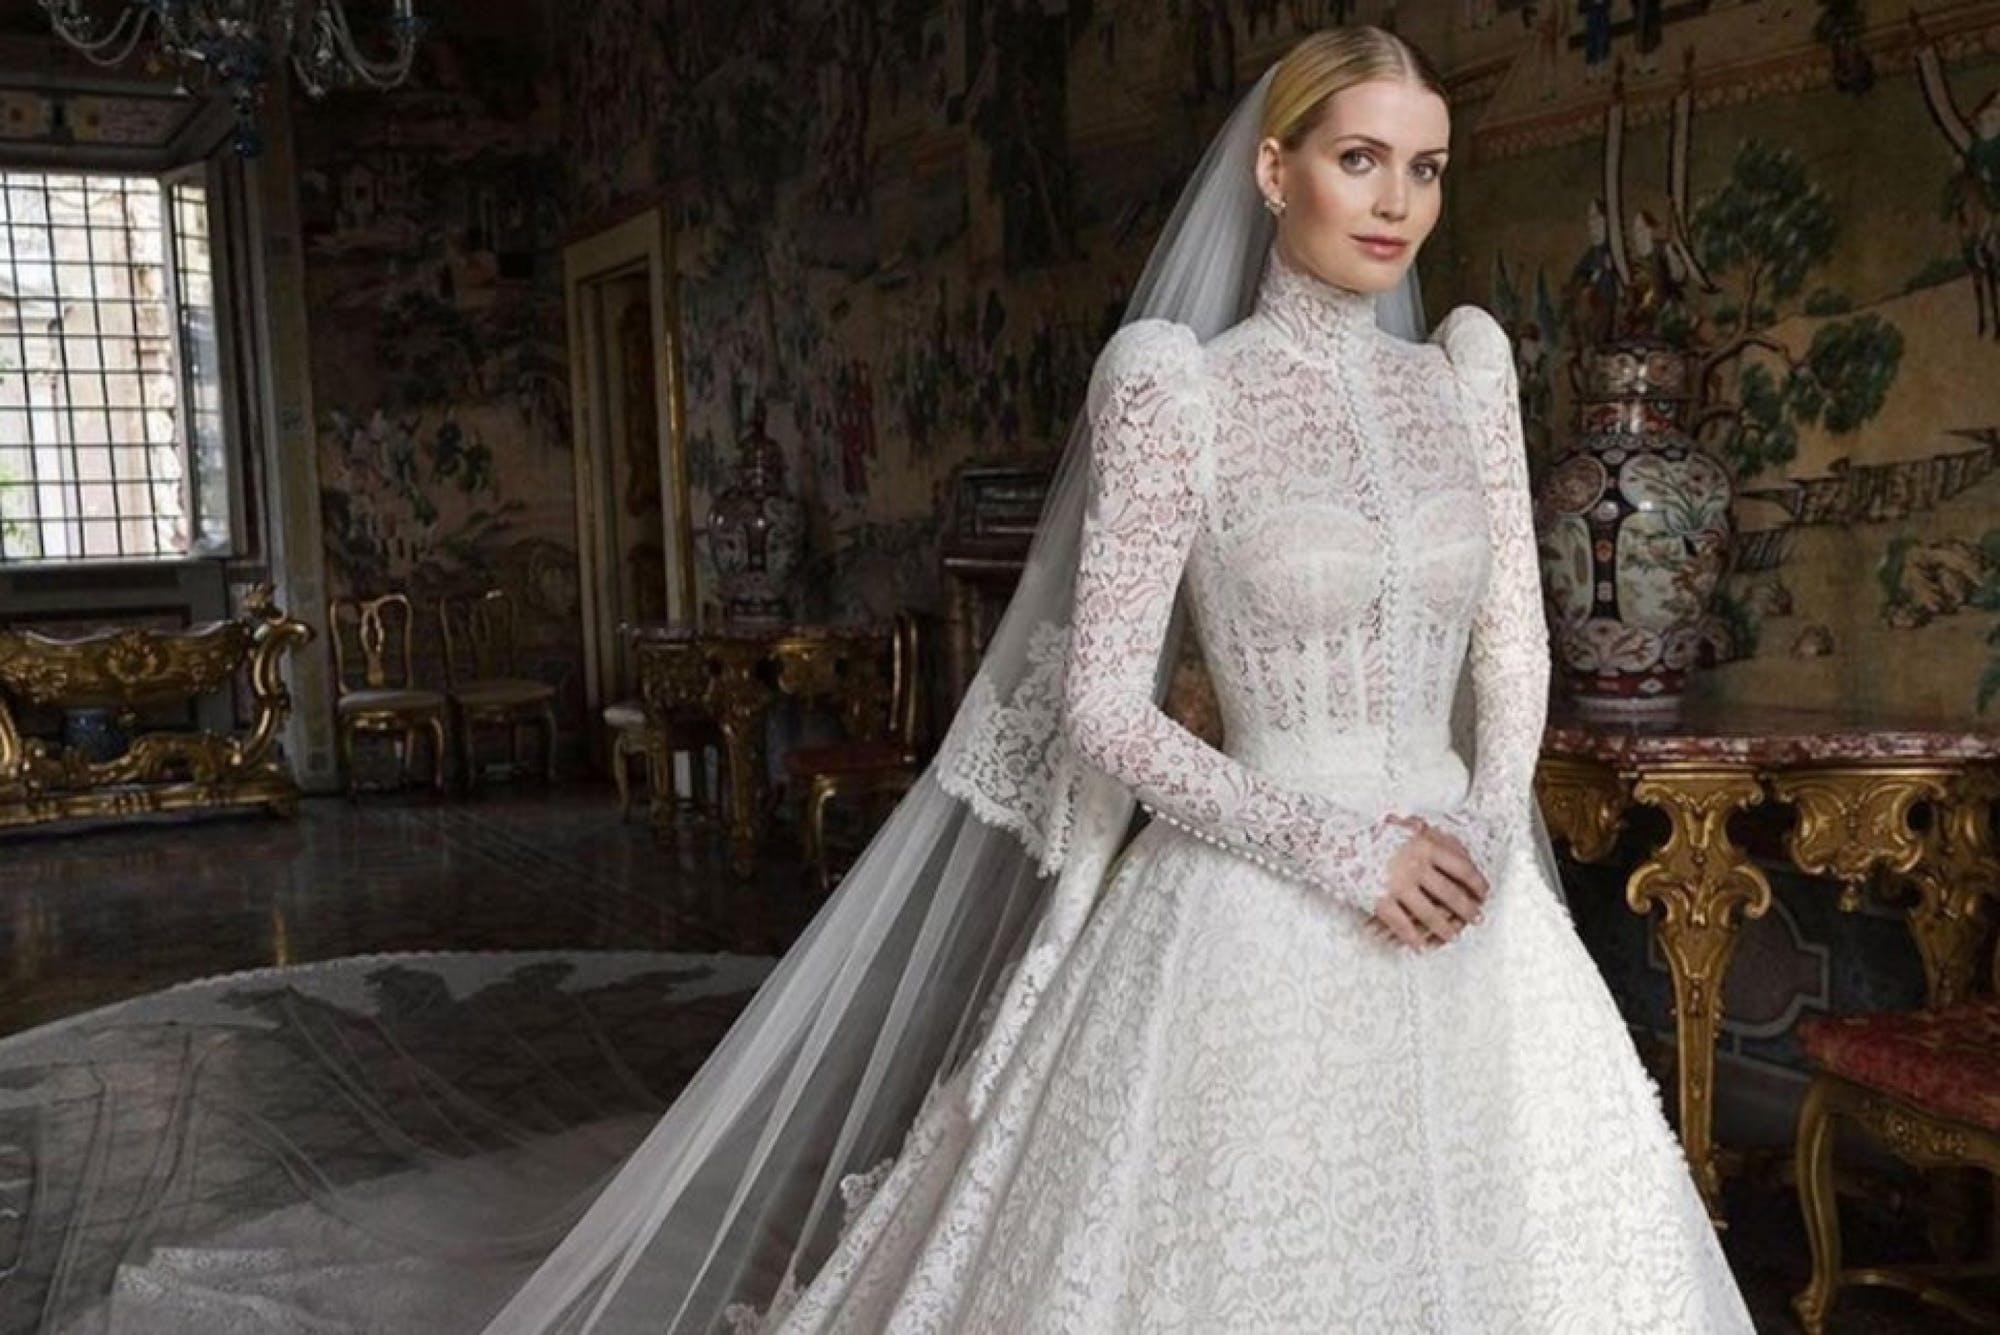 Member News Sarah Haywood Weddings & Celebrations is back: the planner behind Lady Kitty Spencer's Roman wedding